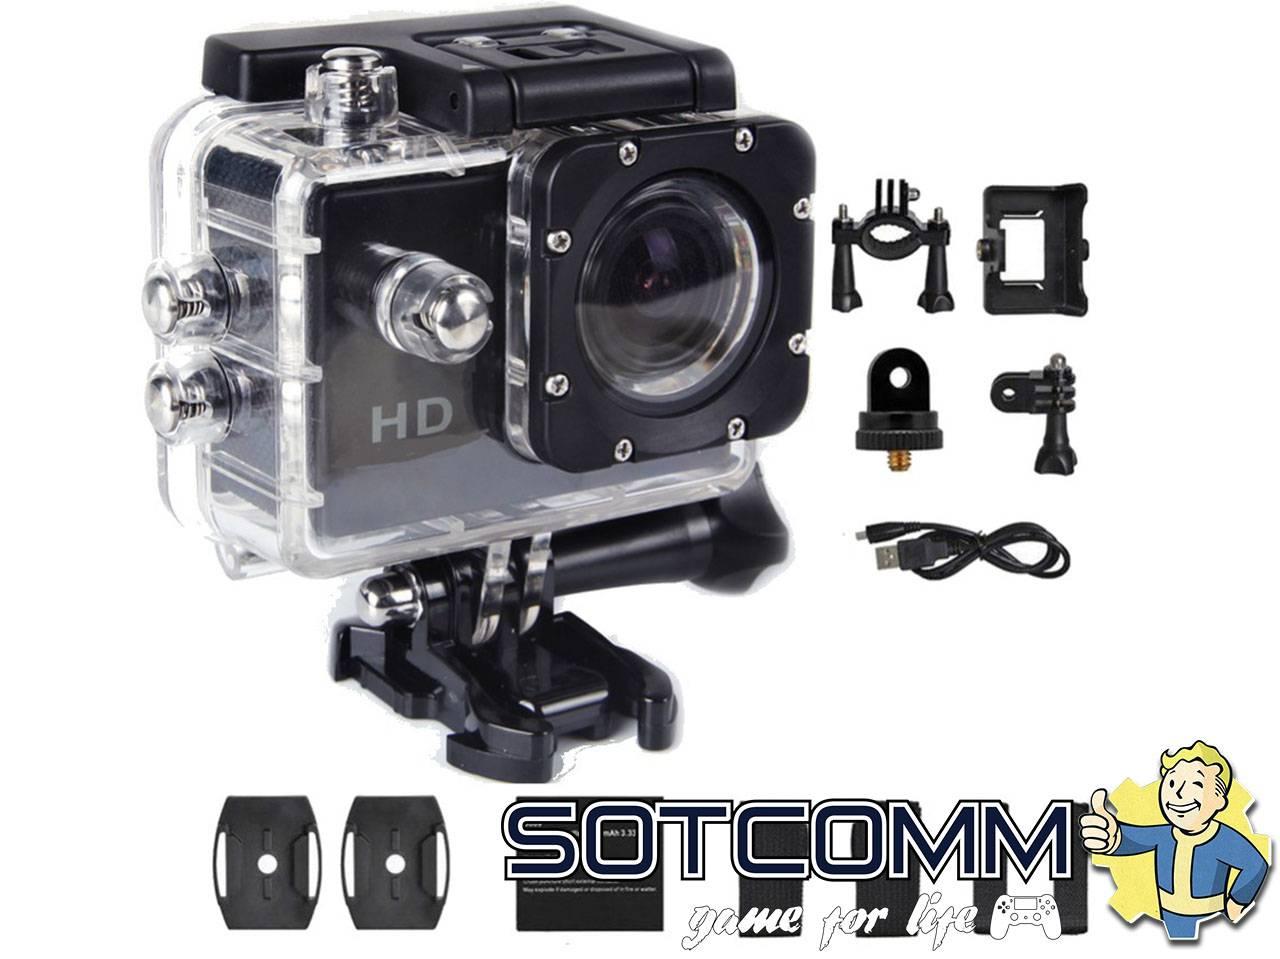 Action camera HD DV 1080p